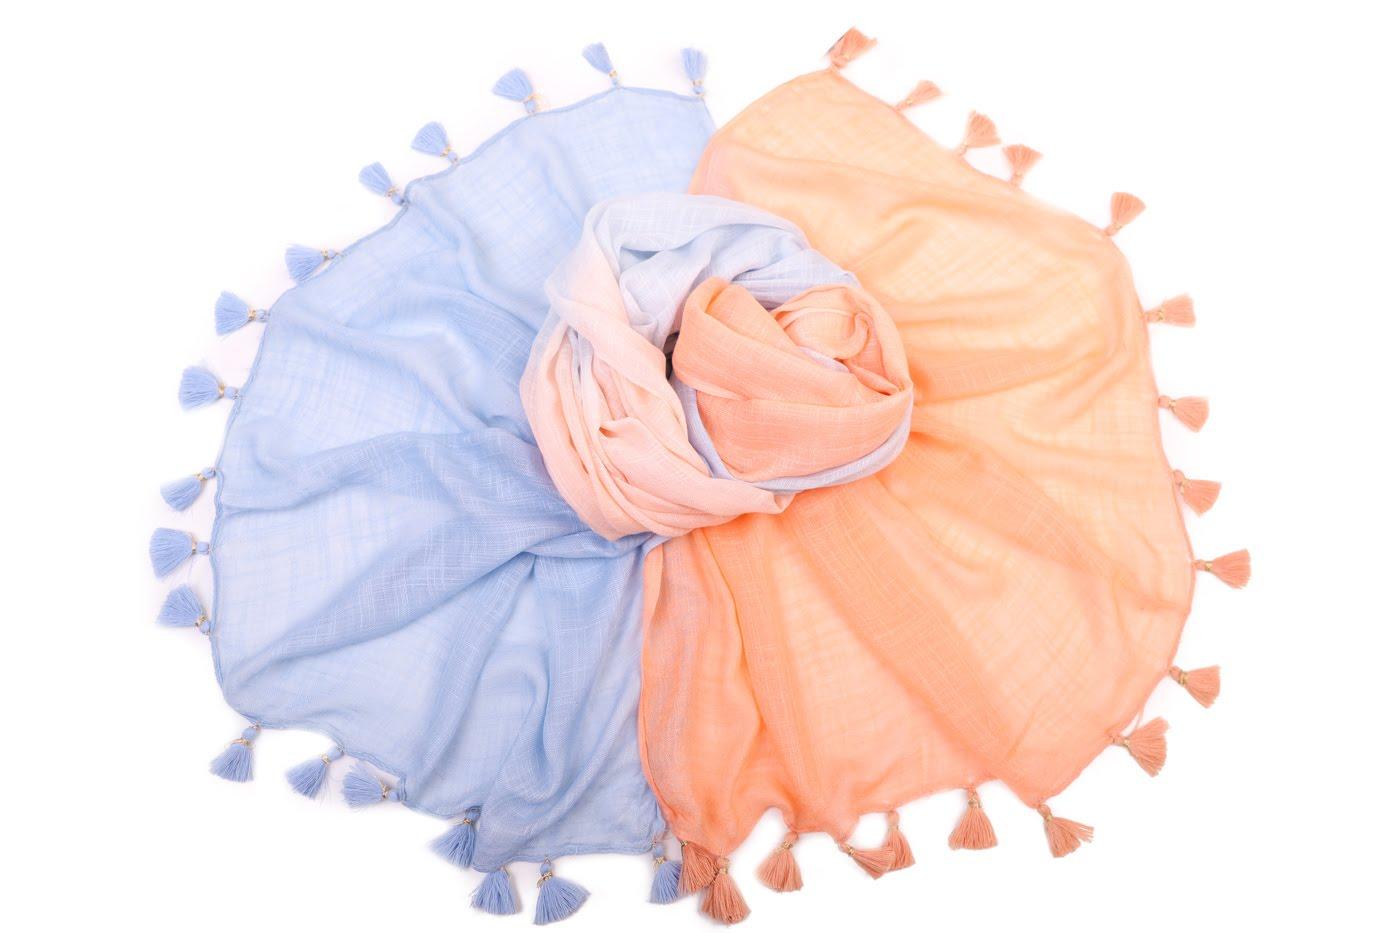 Накидка-палантин Merideth Цвет: Белый, Голубой, Оранжевый (100х180 см) фото